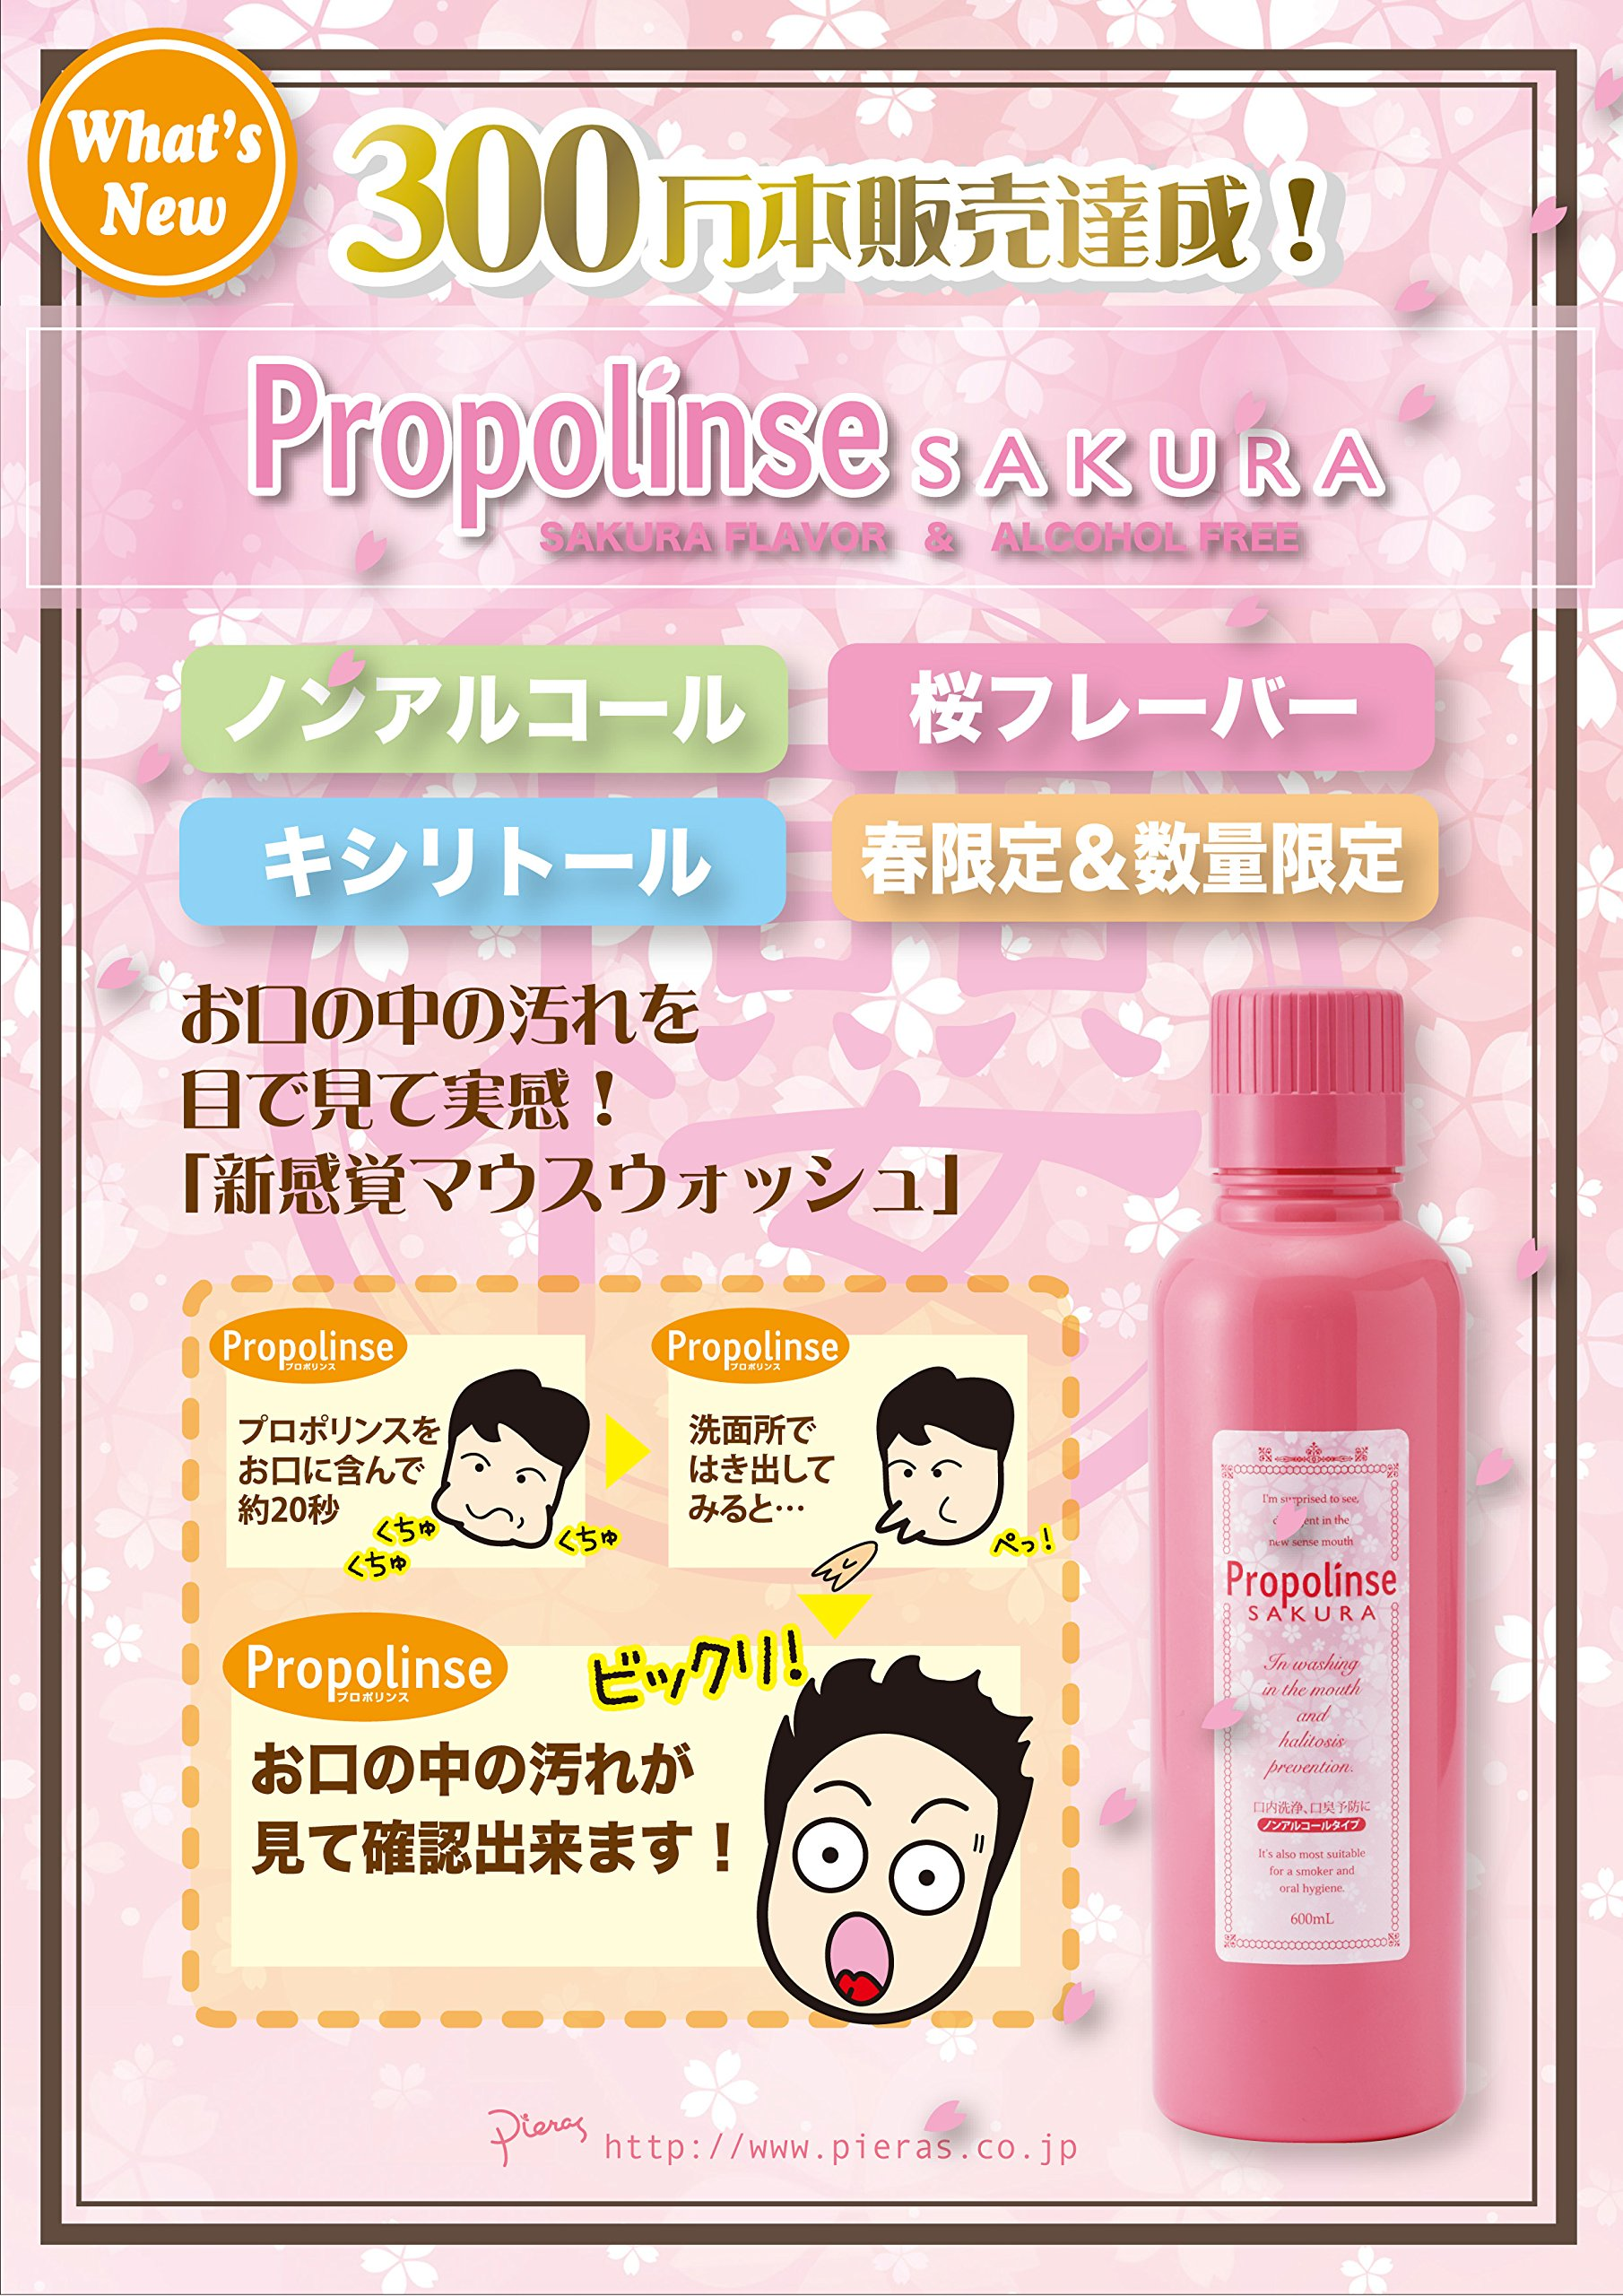 Propolinse Sakura 600ml